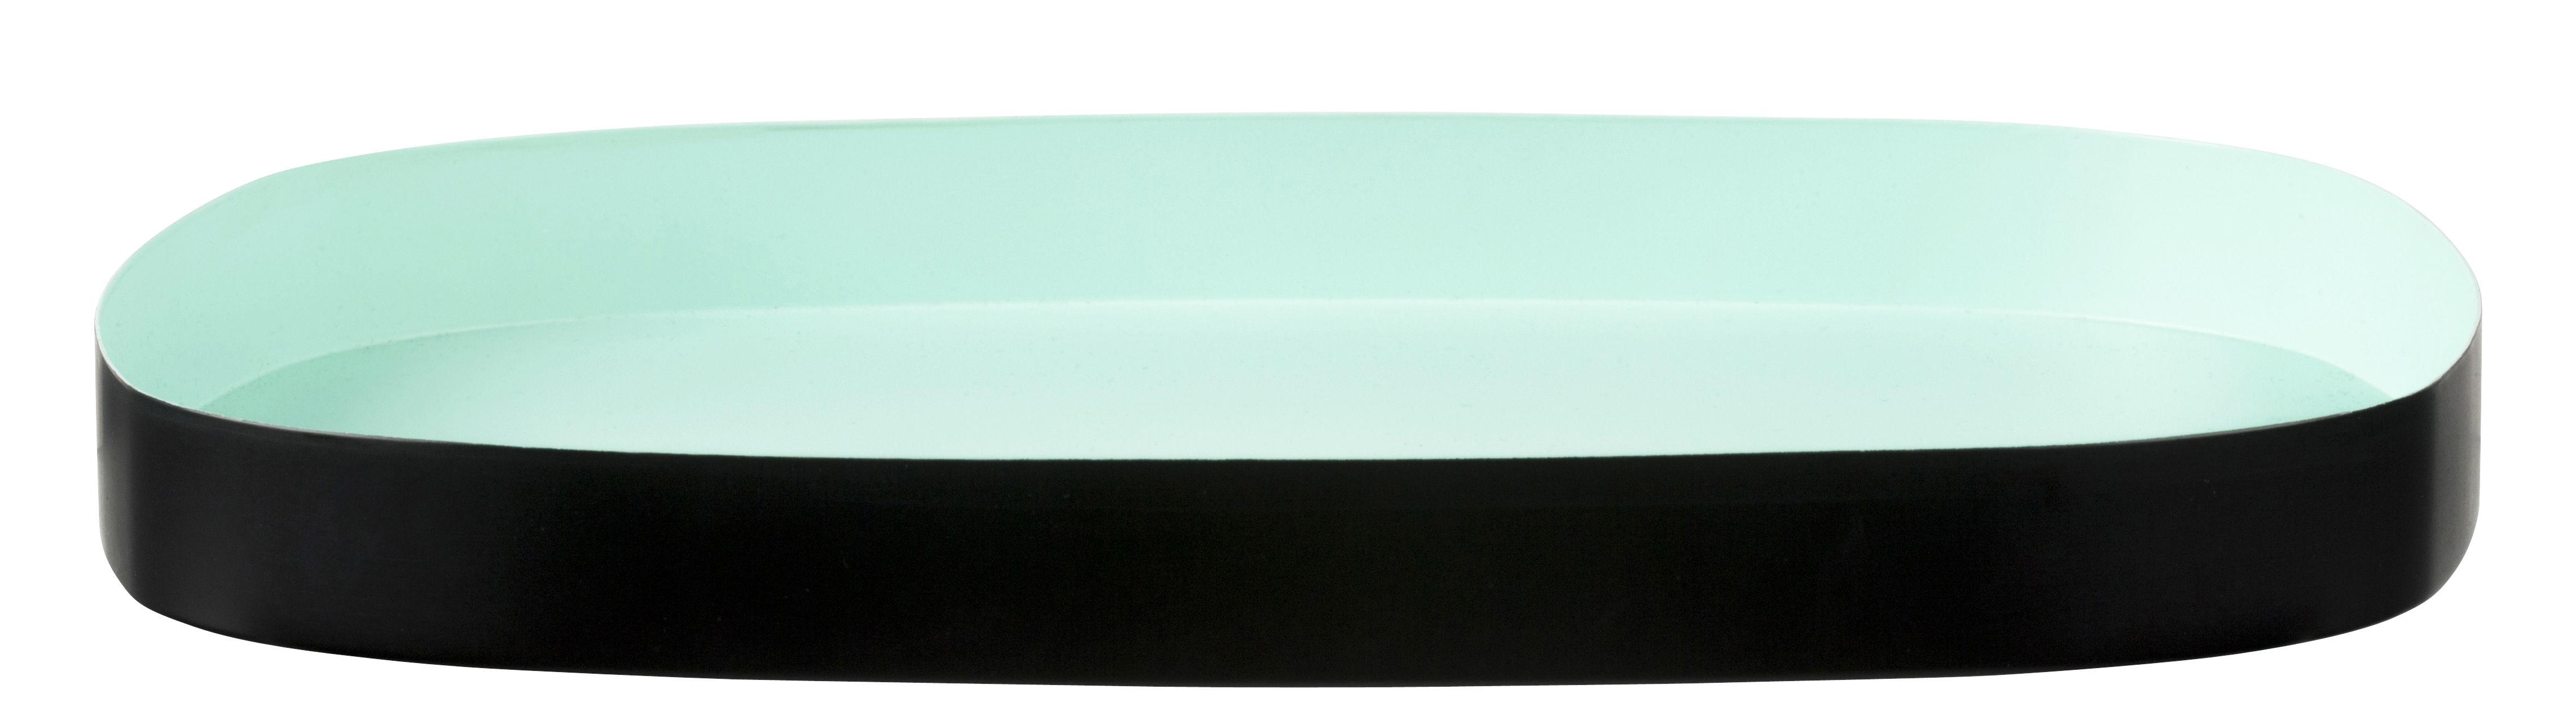 plateau television large 33 x 29 cm vert menthe noir design letters. Black Bedroom Furniture Sets. Home Design Ideas